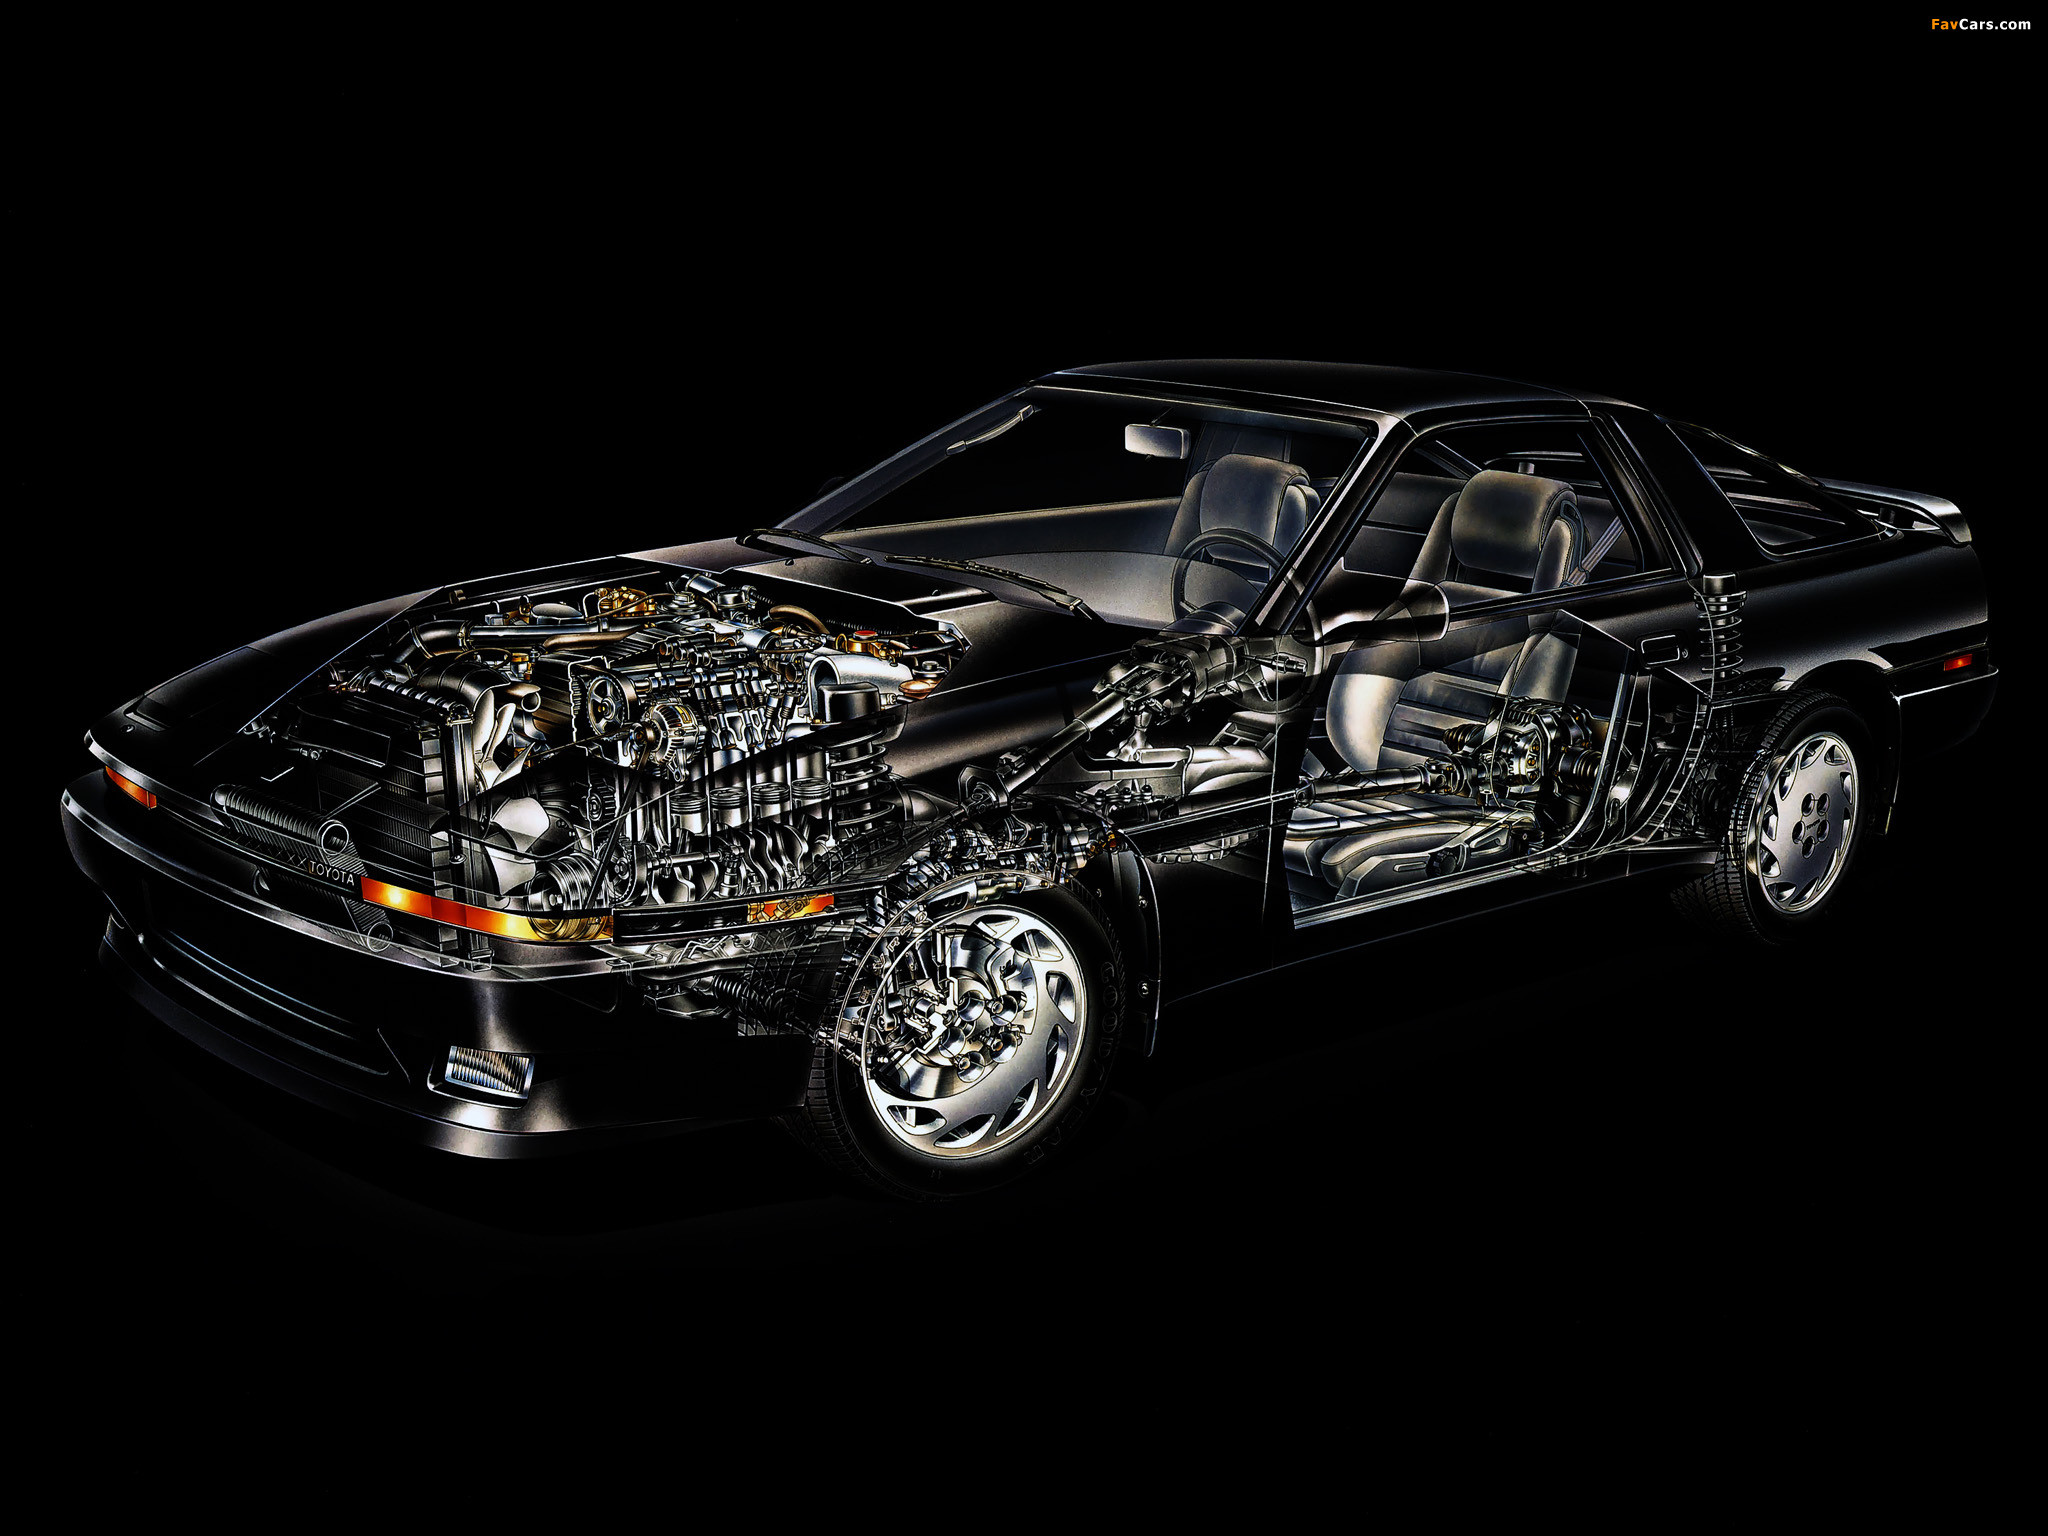 1242x2208 Toyota   Fu0026F Toyota Supra   Wallpapers